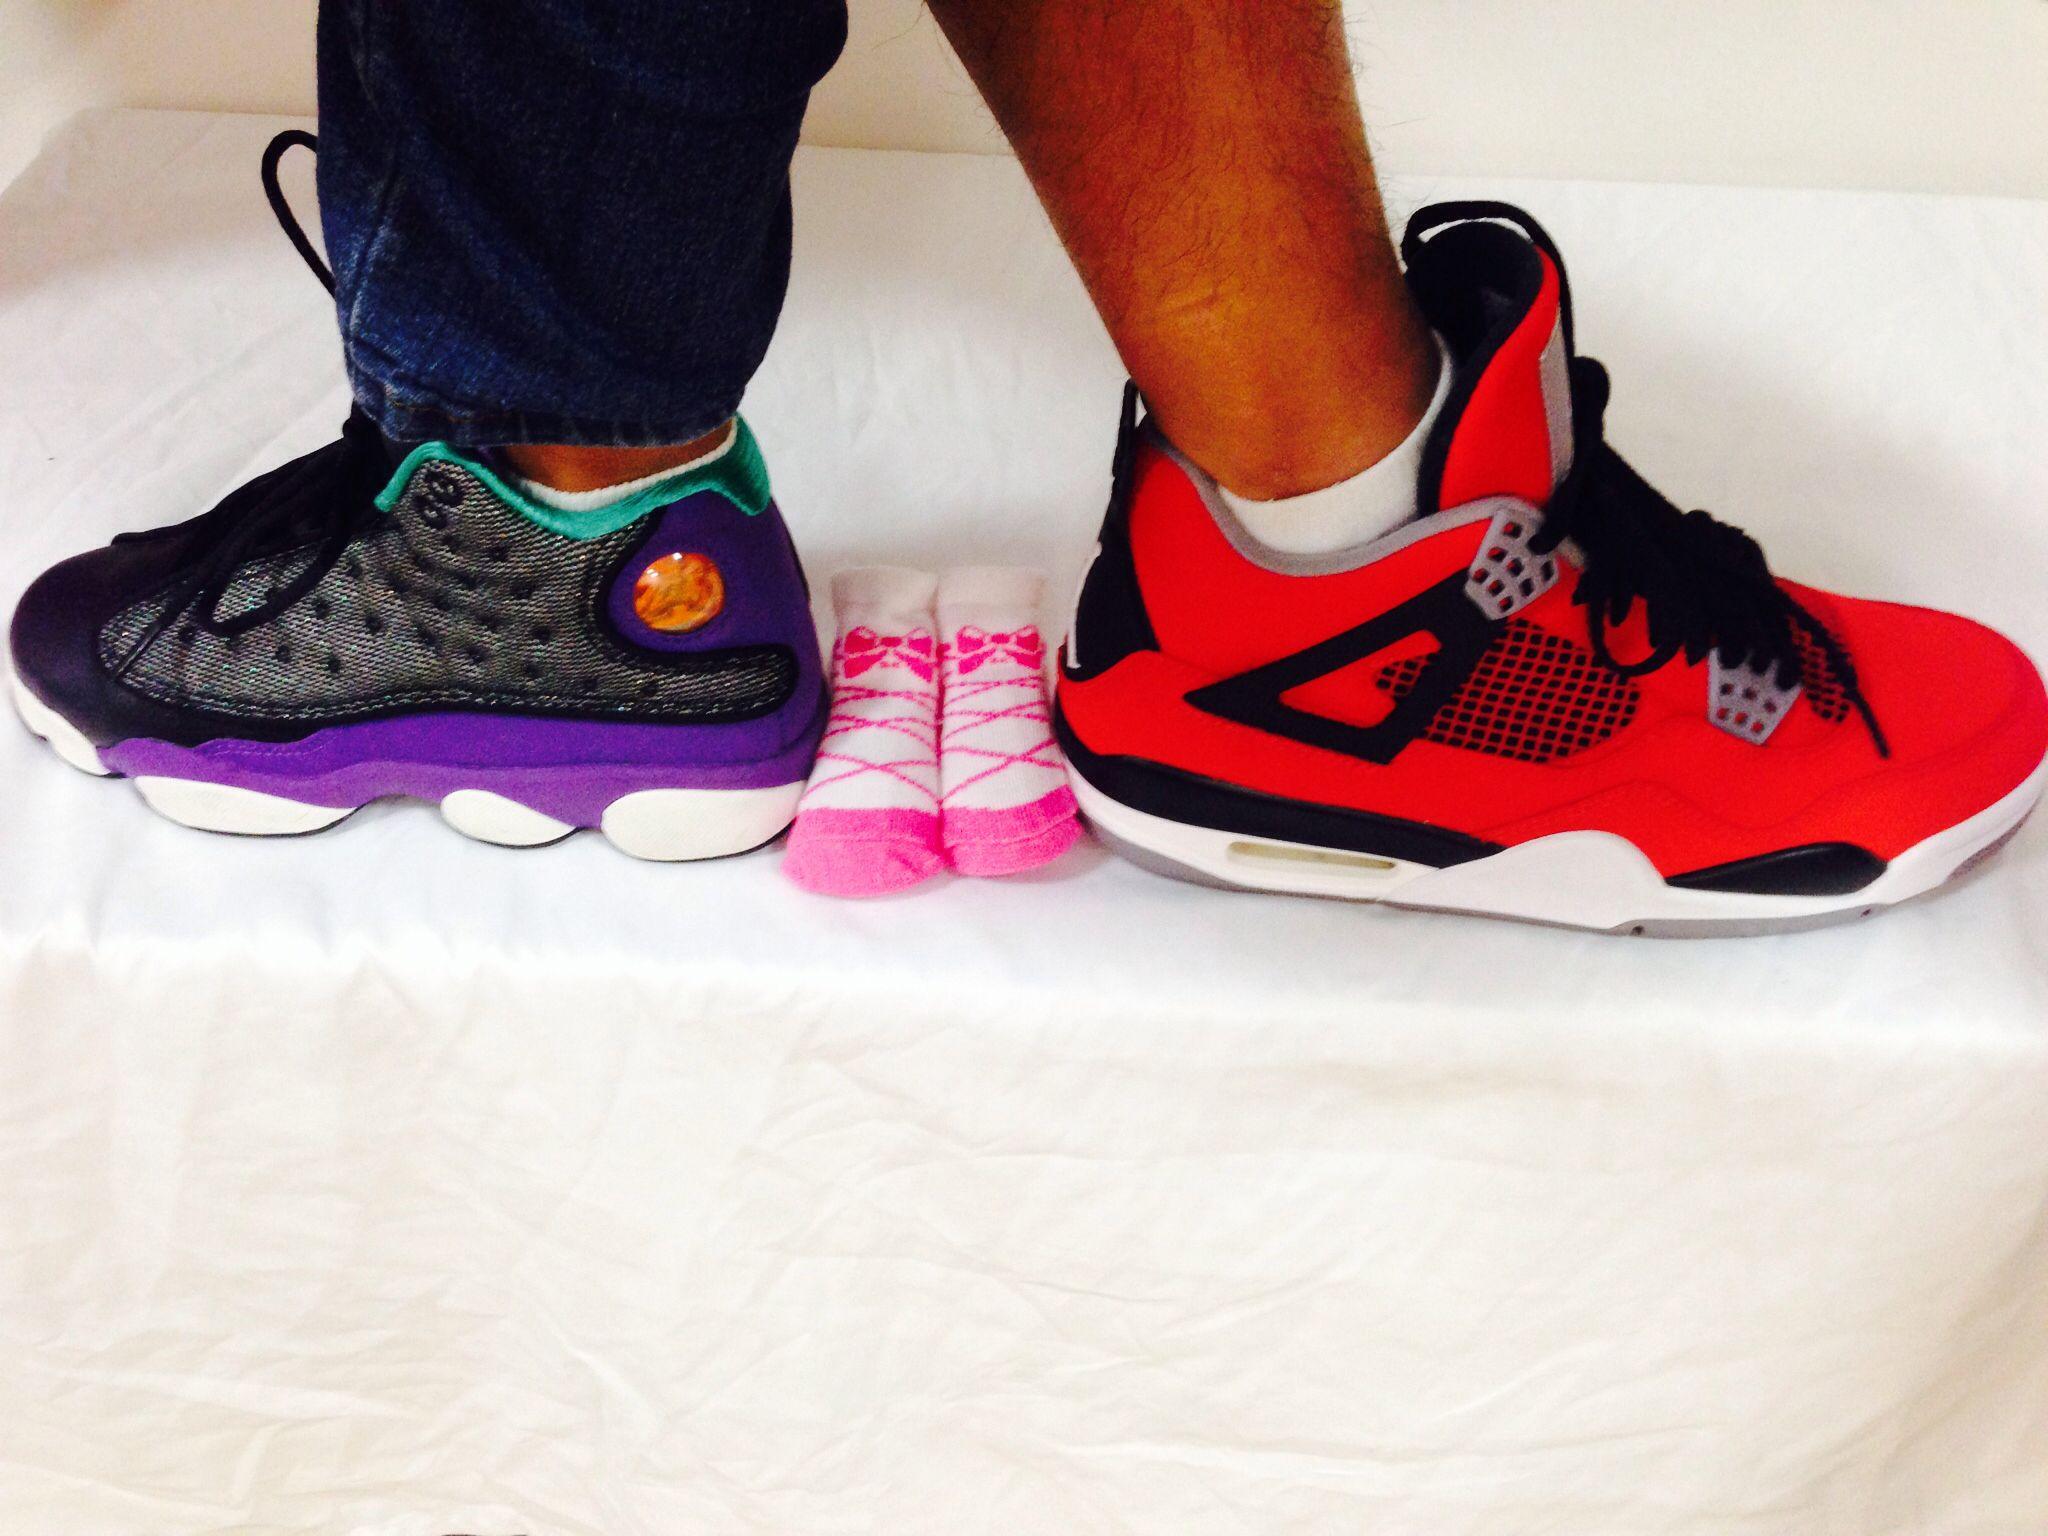 More Sneakerhead gender reveal! Using Jordan shoes and baby socks. It's a  girl!